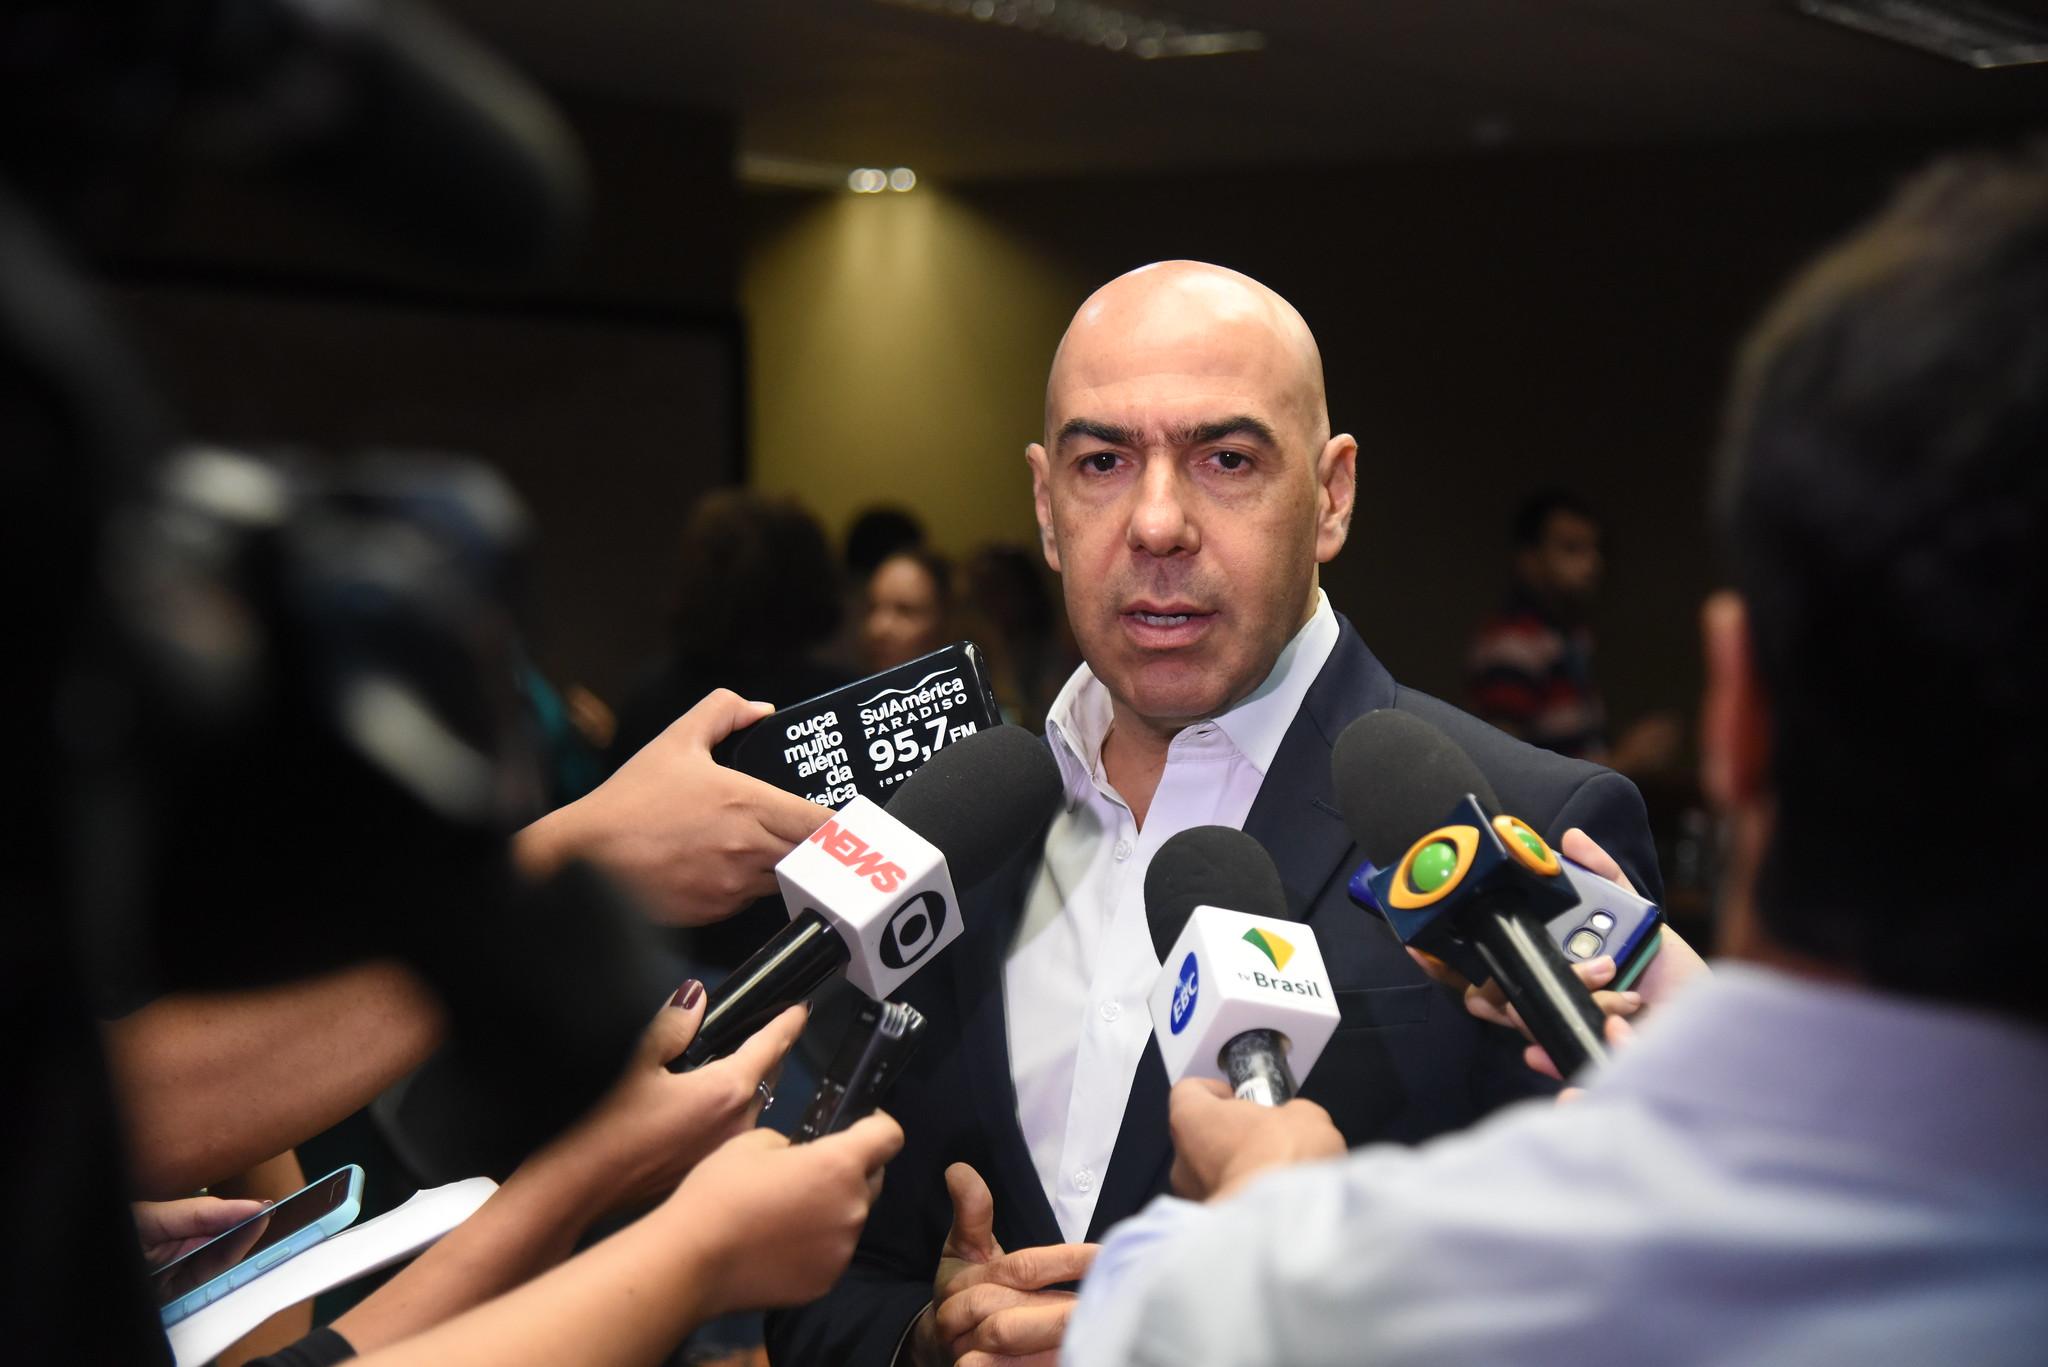 Réveillon Rio 2020 -  Marcelo Alves (Presidente Riotur) - Rio de Janeiro. 26.12.2019. Photo: Alexandre Macieira / Riotur.